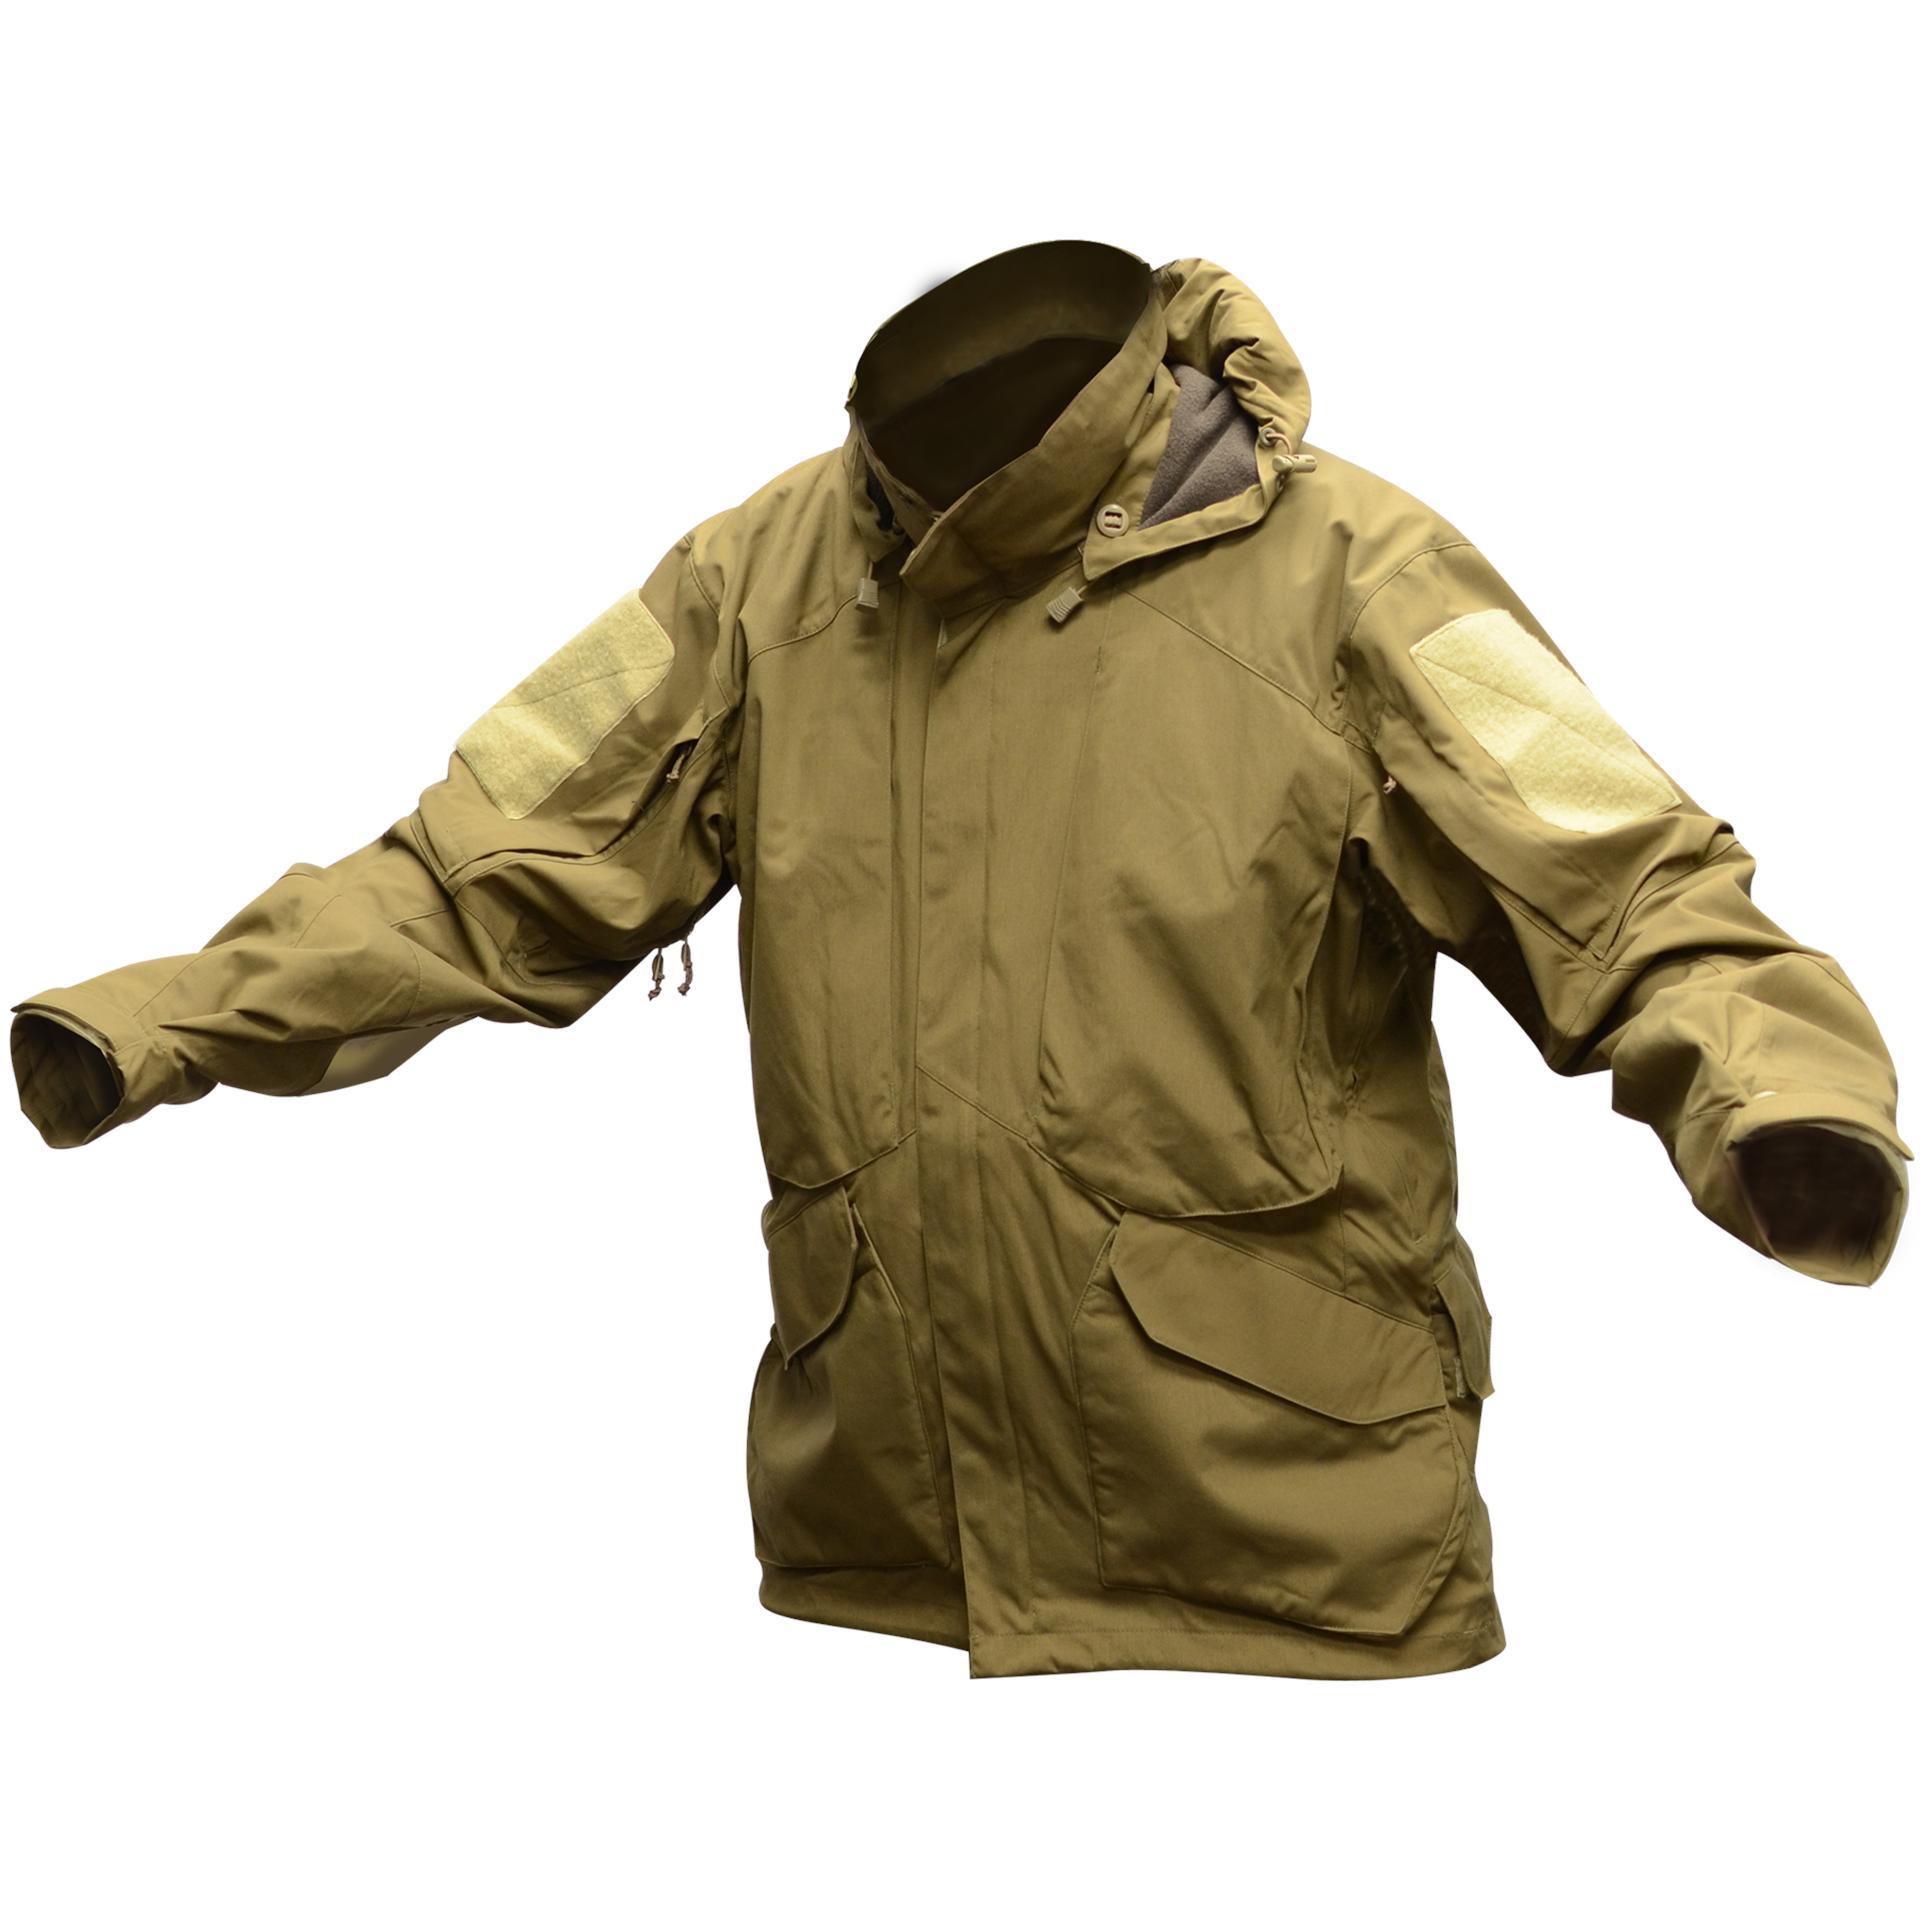 b3725667 Find every shop in the world selling bekledning overdeler jakker ...